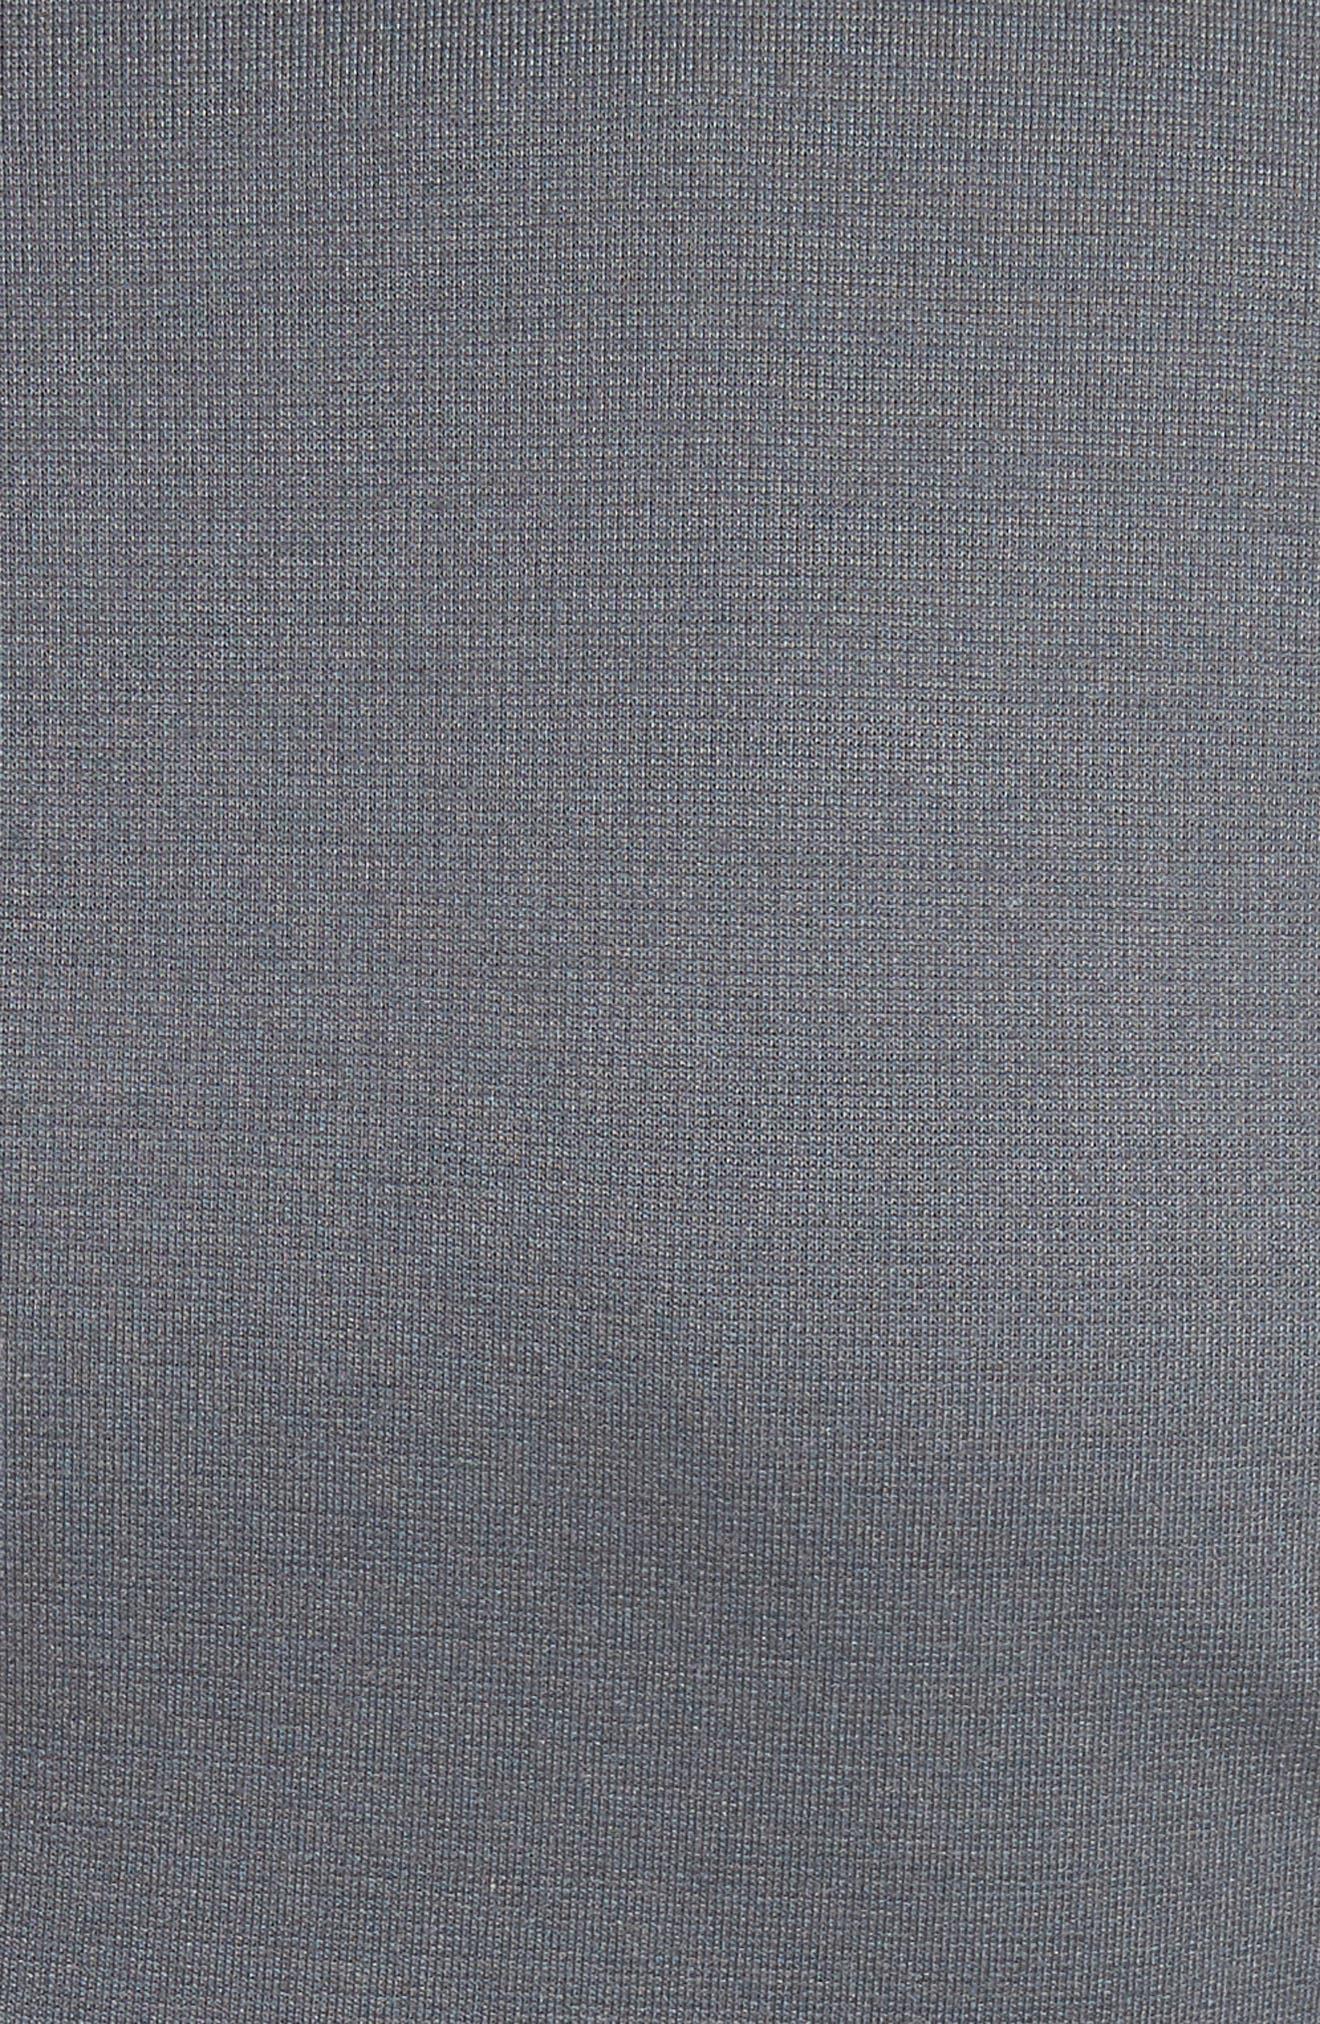 Anaste Mirror Minerals Print Dress,                             Alternate thumbnail 5, color,                             021